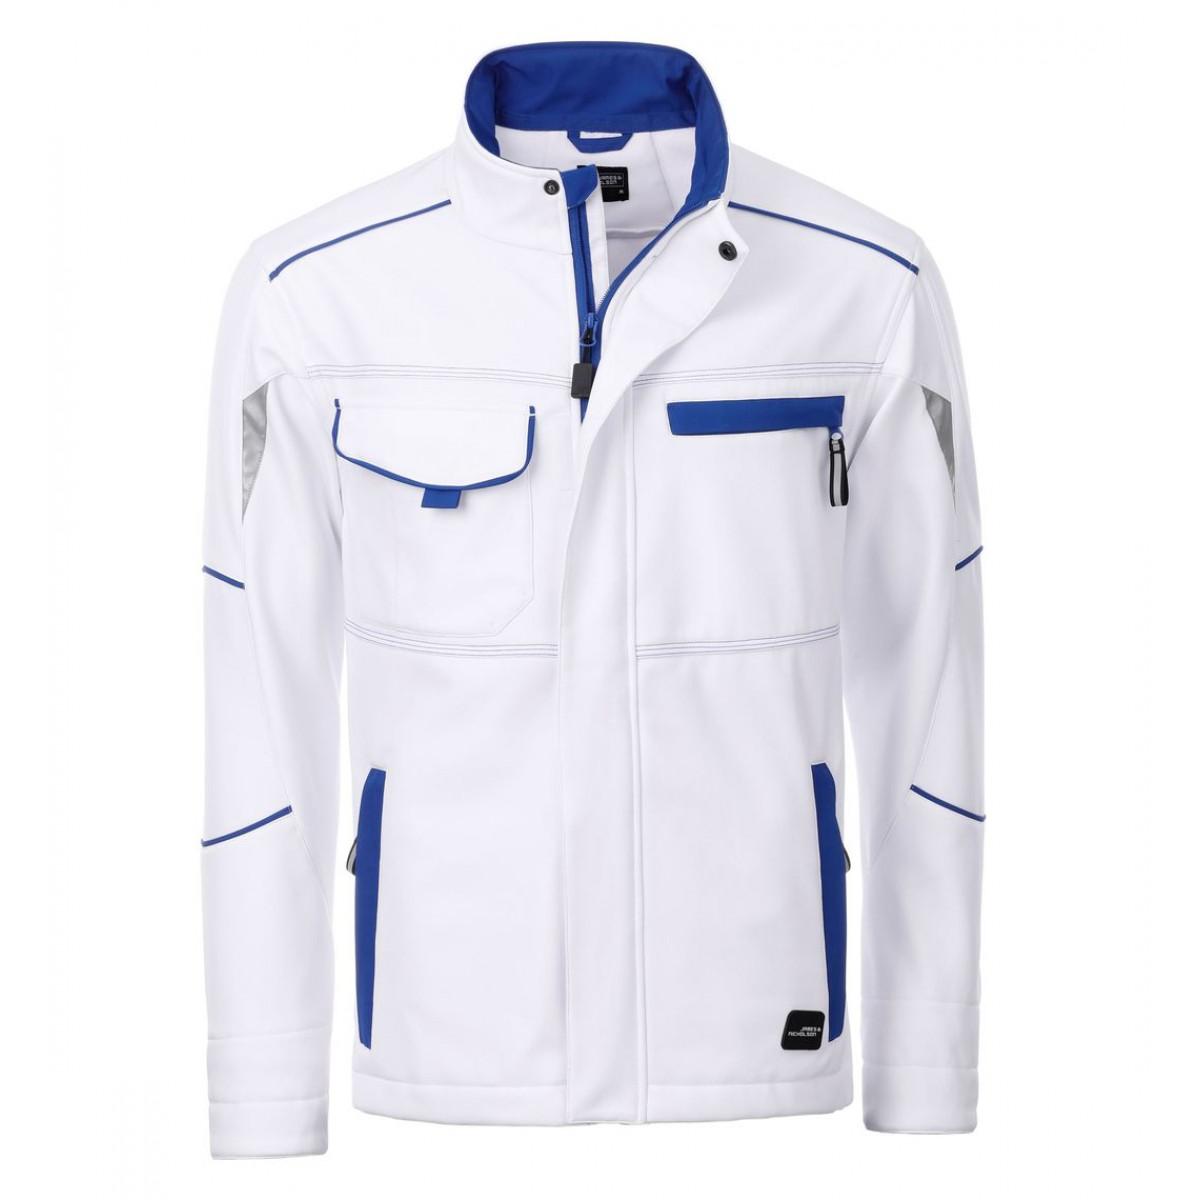 Куртка мужская JN851 Workwear Softshell Jacket-Level 2 - Белый/Ярко-синий